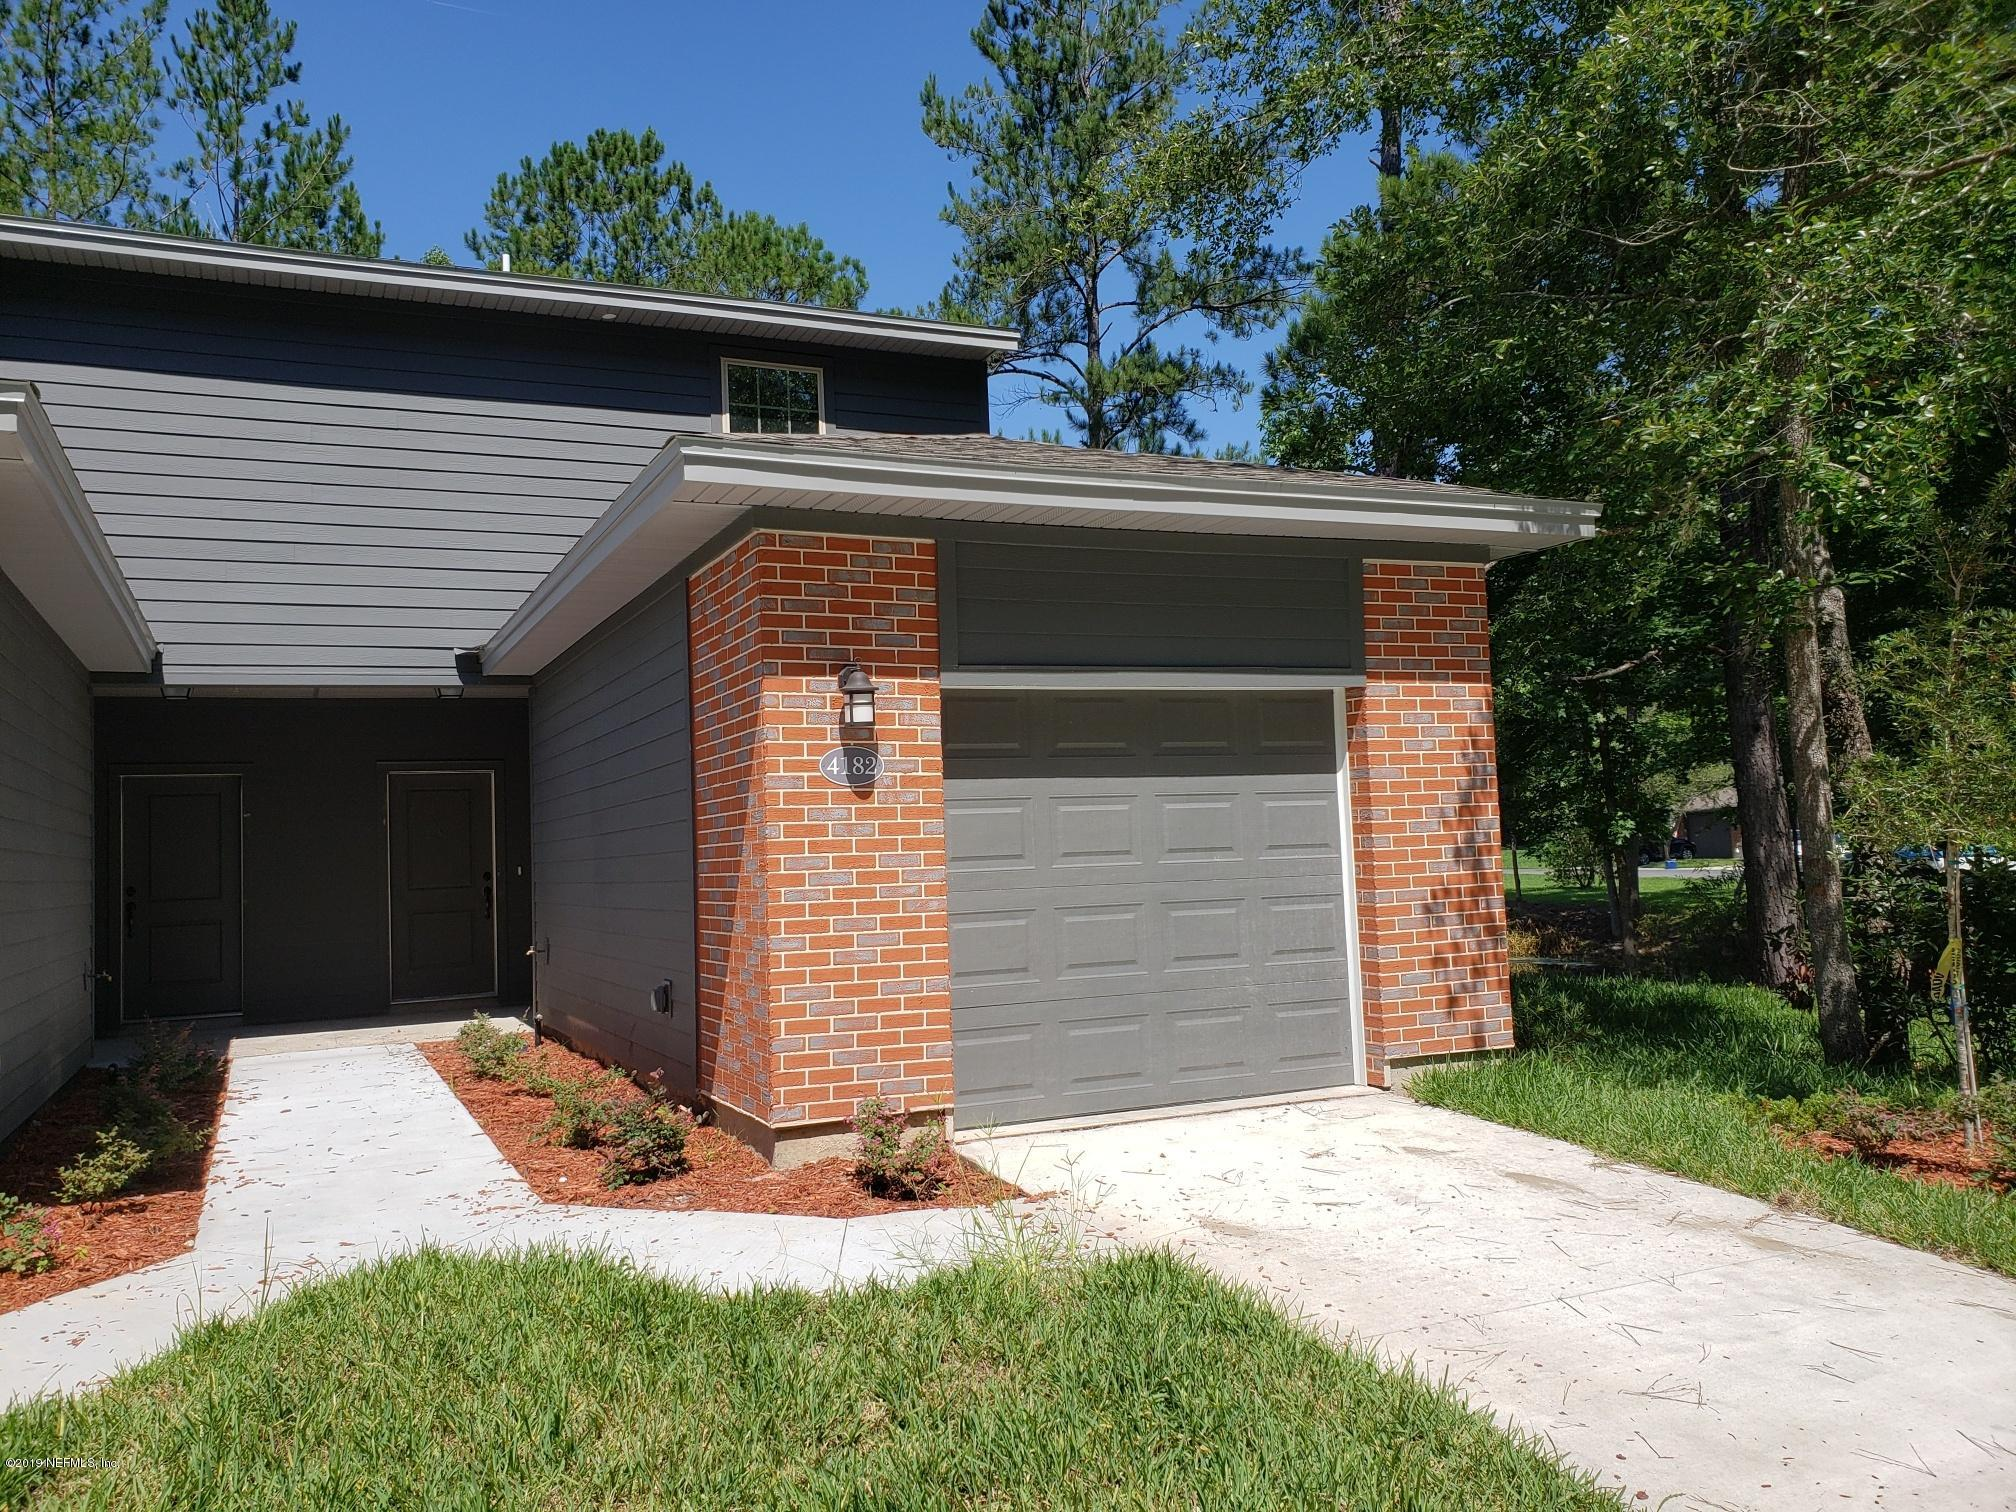 4182 QUIET CREEK- MIDDLEBURG- FLORIDA 32068, 3 Bedrooms Bedrooms, ,2 BathroomsBathrooms,Condo,For sale,QUIET CREEK,1021284